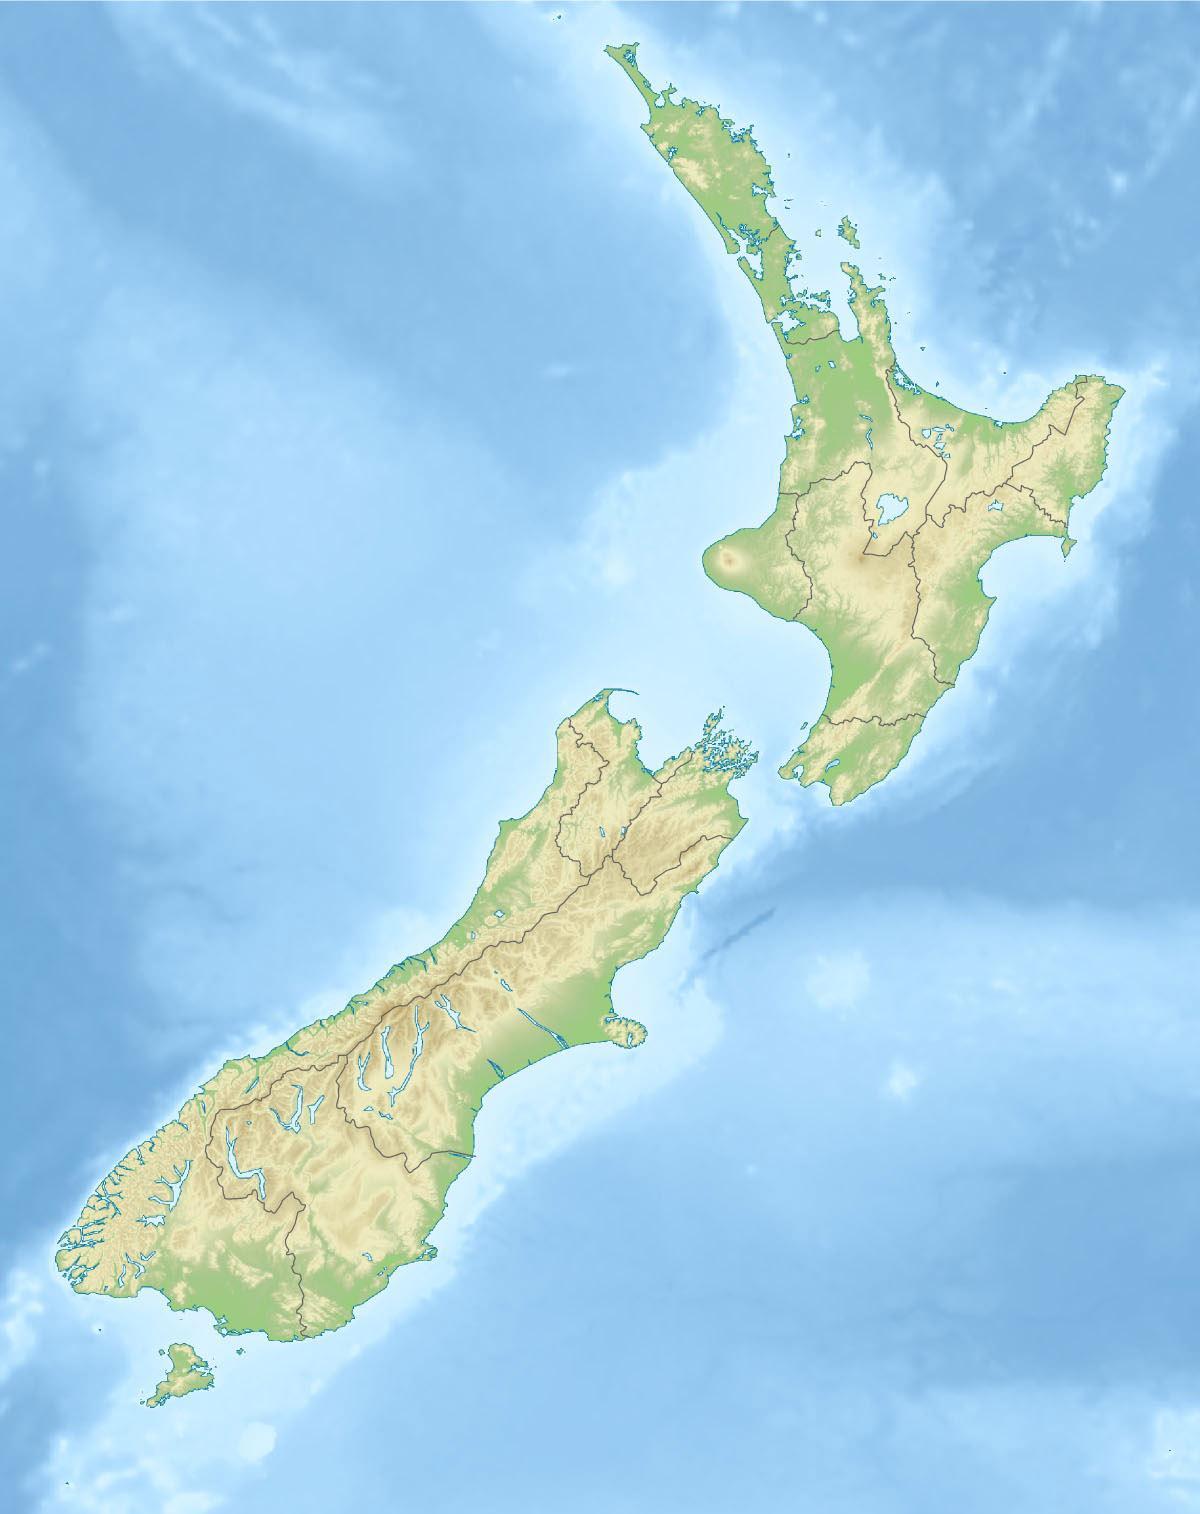 Cartina Nuova Zelanda.Nuova Zelanda Mappa Fisica Nuova Zelanda Caratteristiche Fisiche Mappa Australia E Nuova Zelanda Oceania